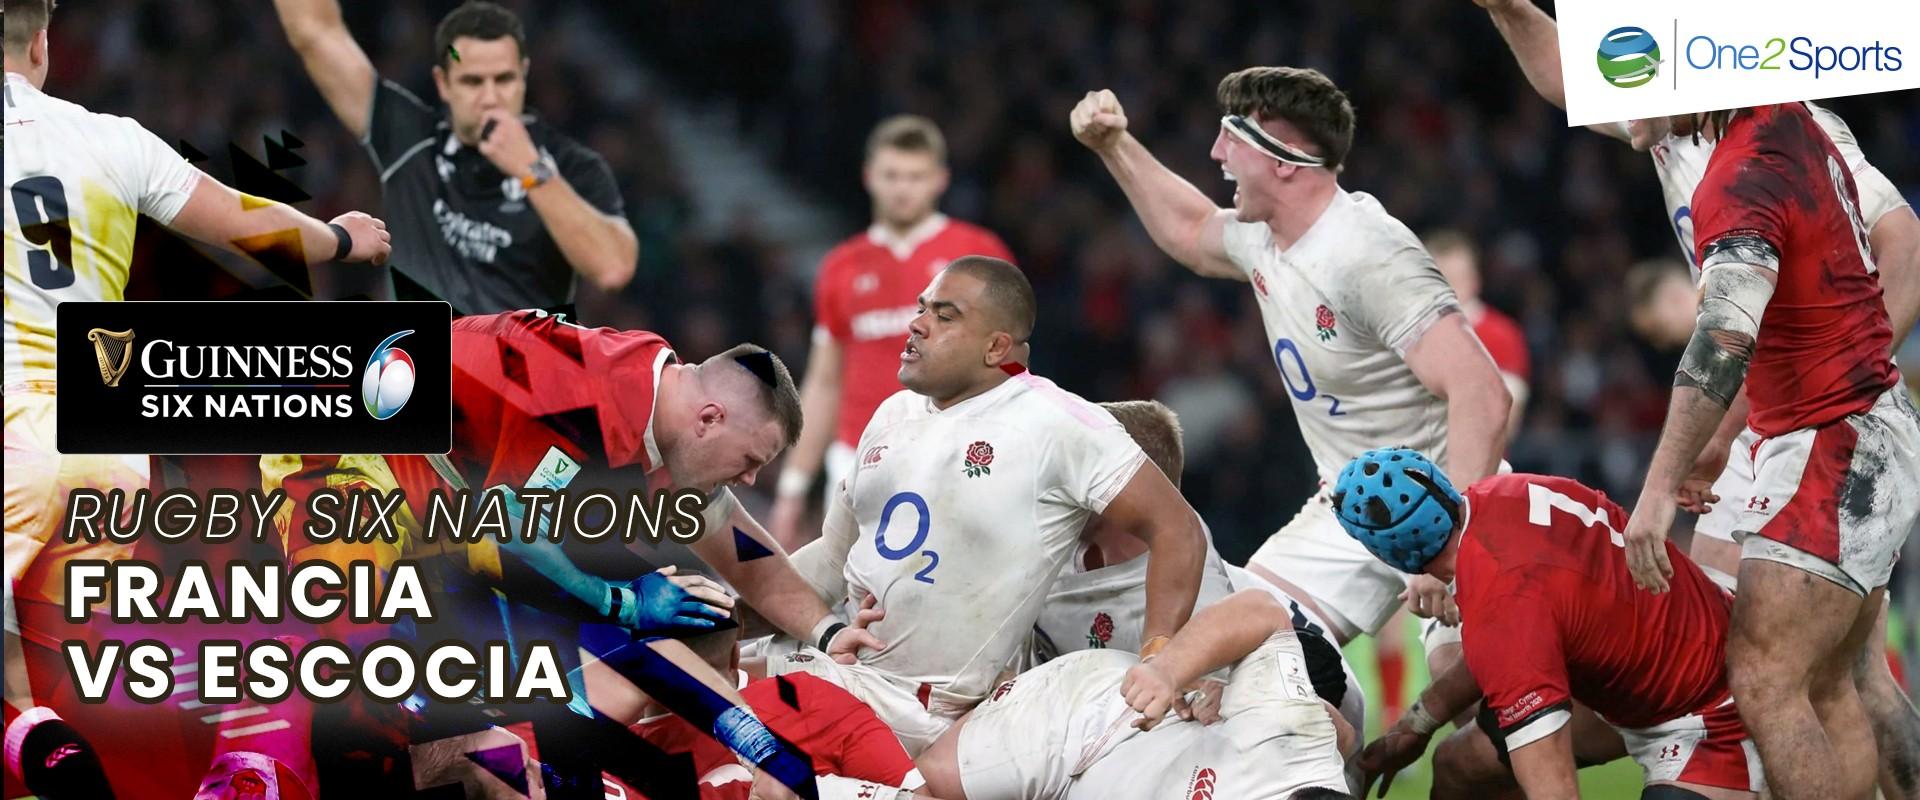 Francia vs Escocia